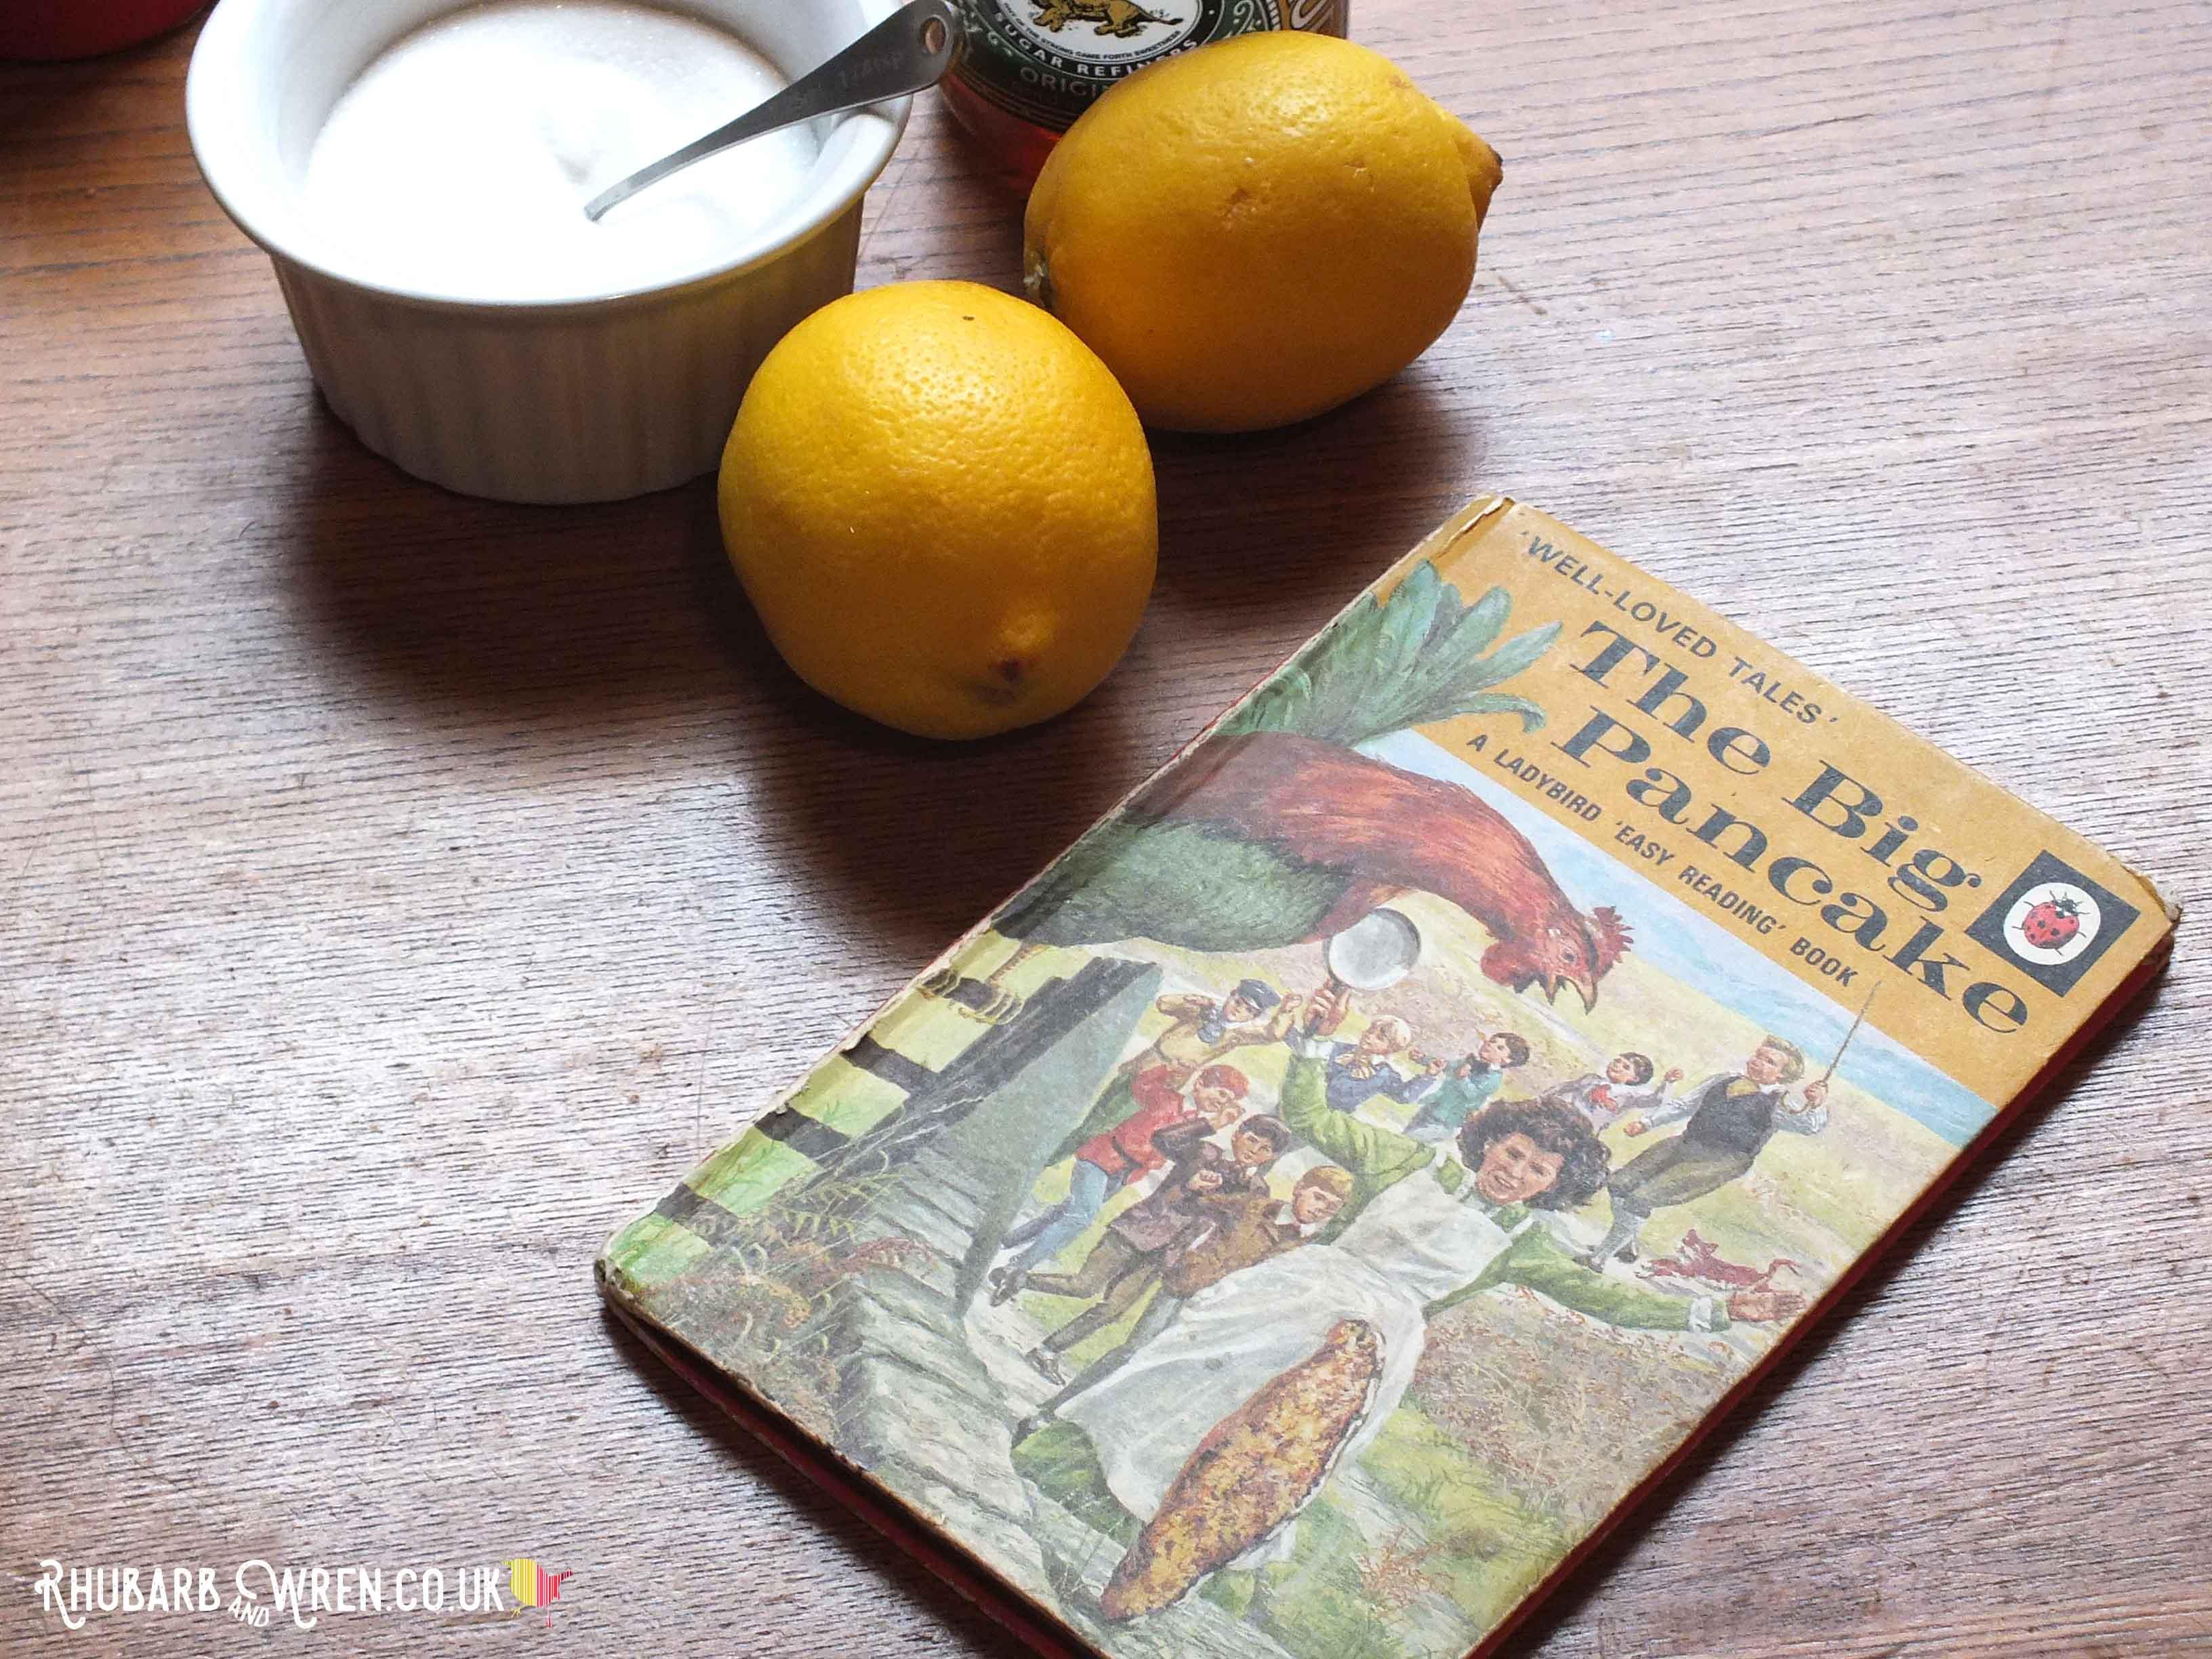 Ladybird Books classic - the Big Pancake